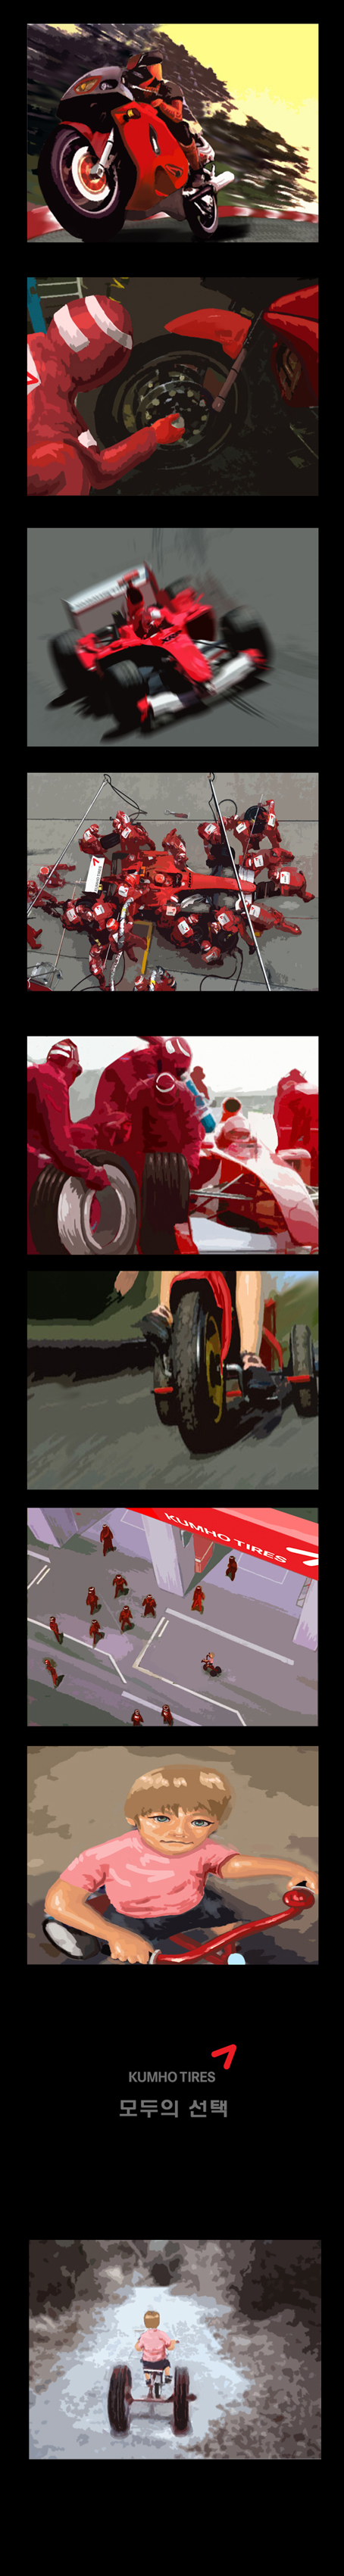 Kumho Tire CF Conti (2009)